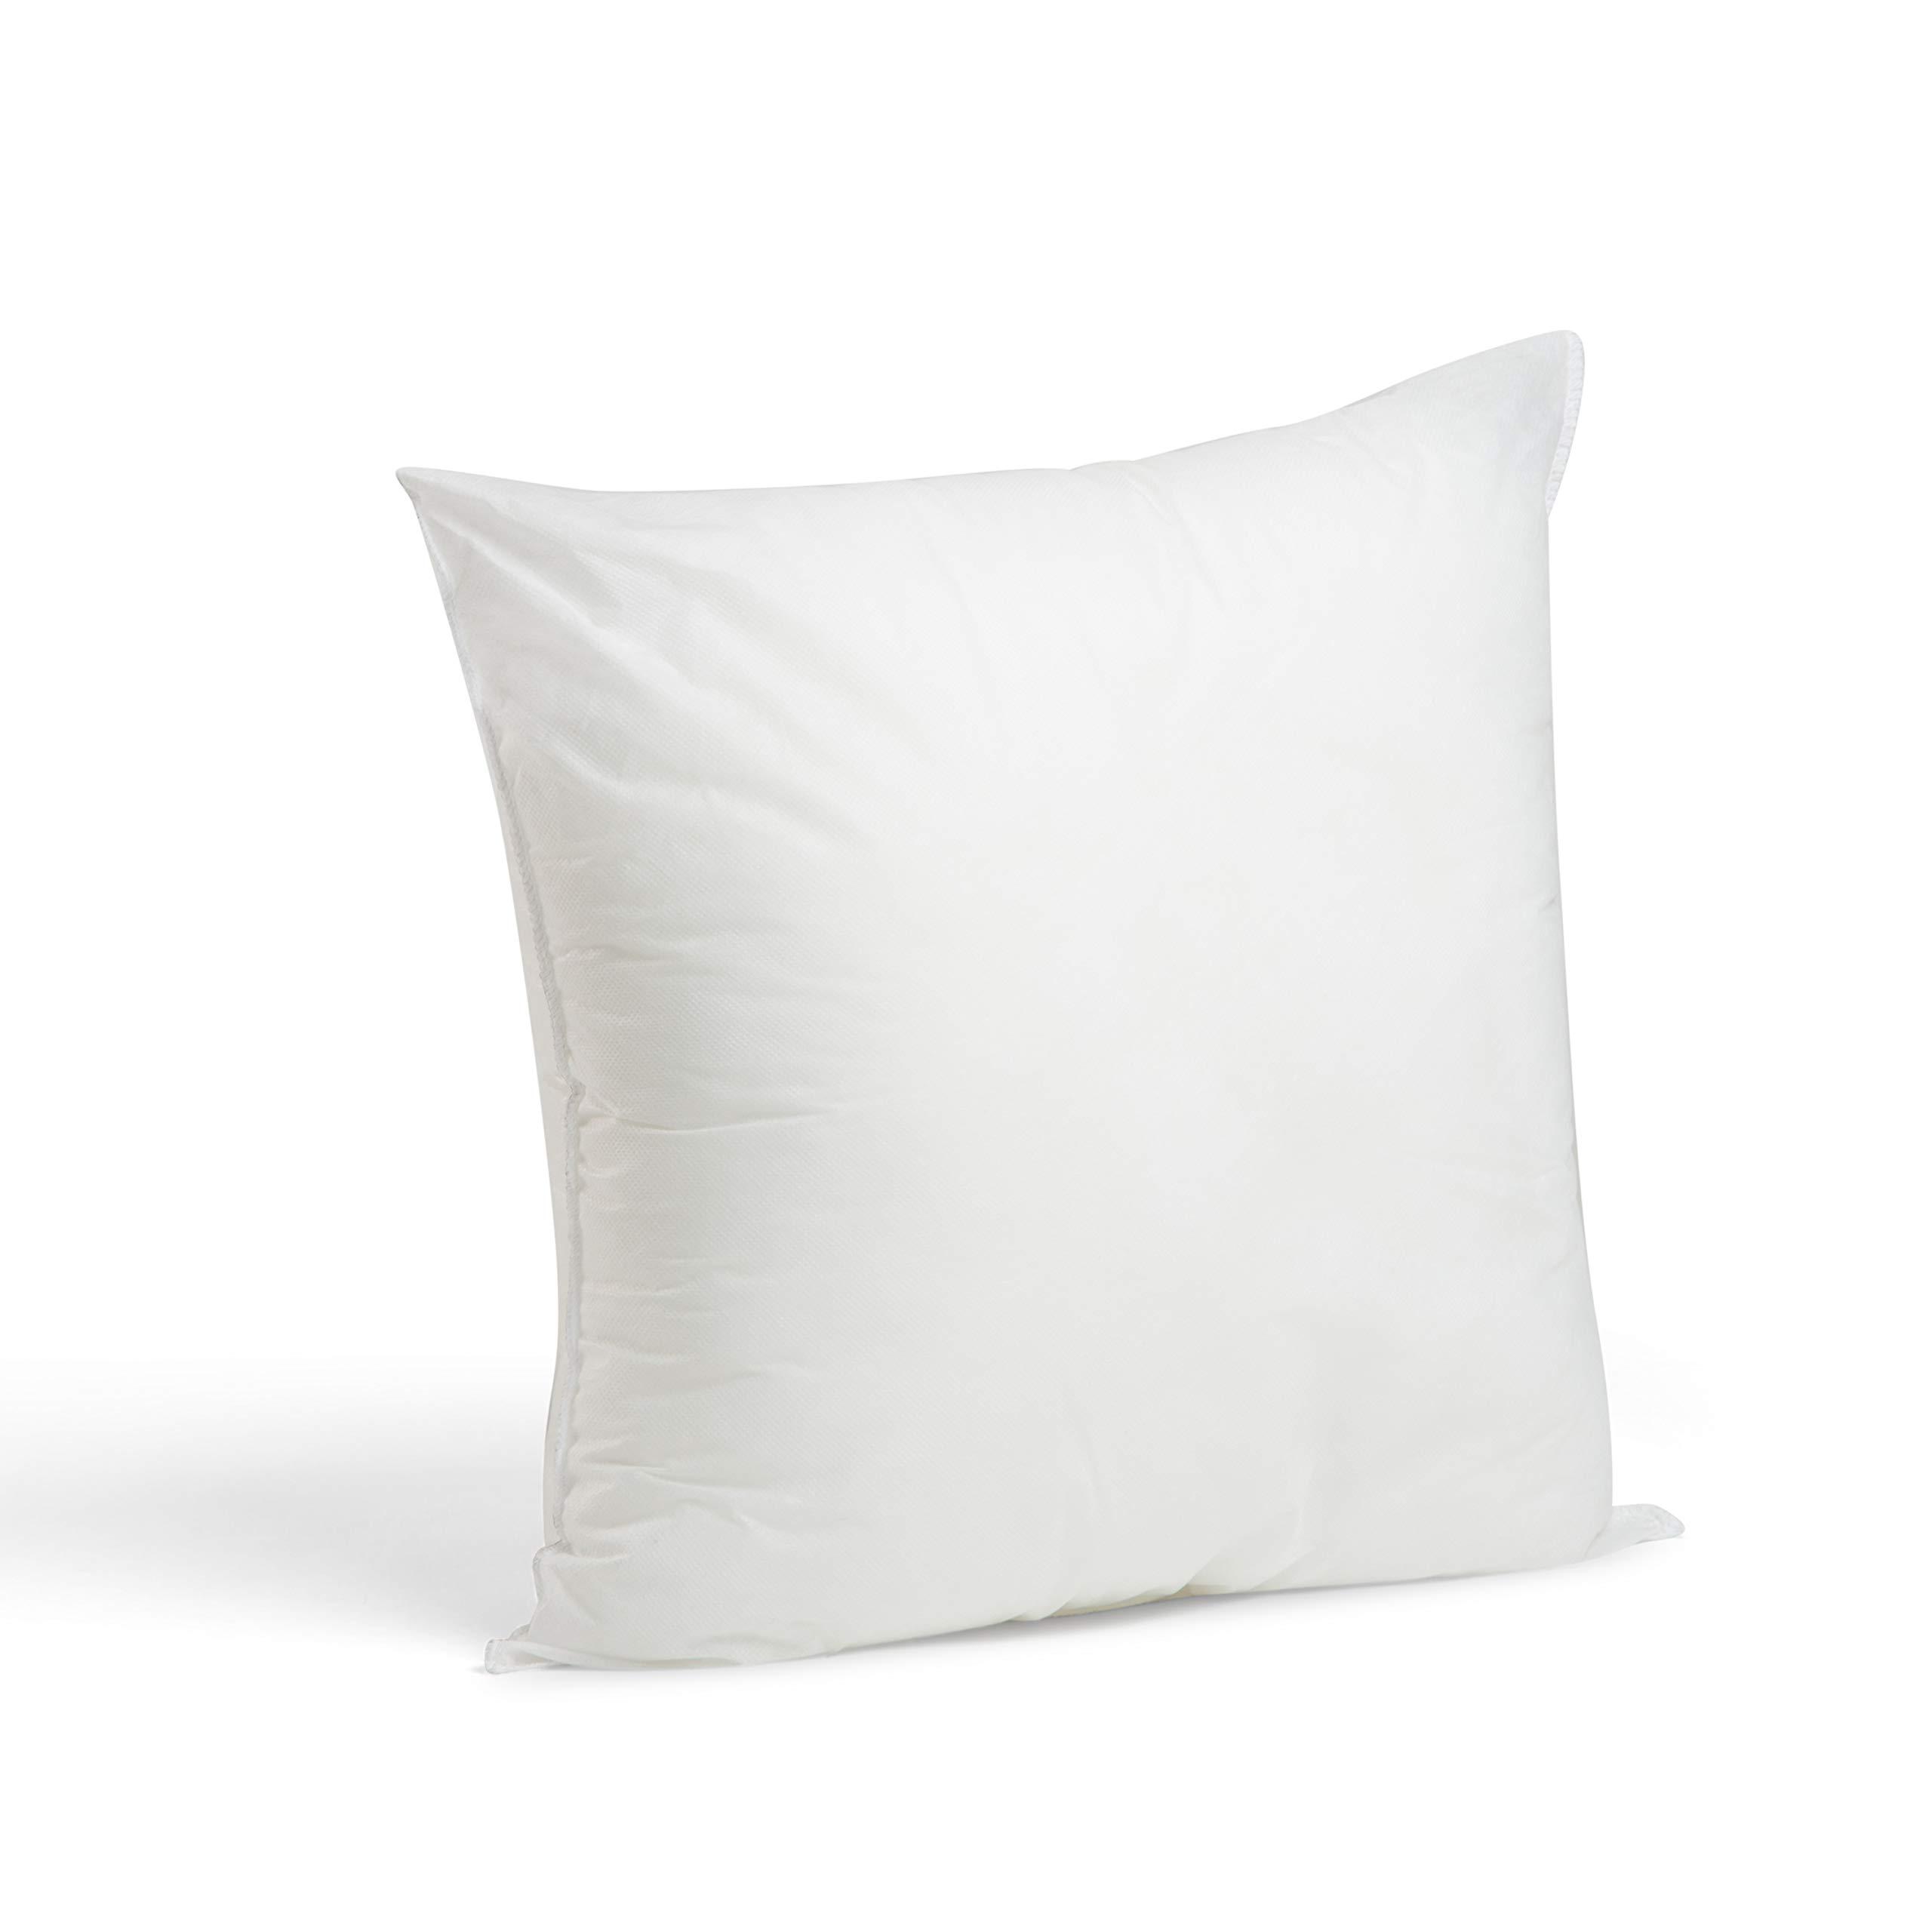 Foamily Premium Hypoallergenic Polyester Standard